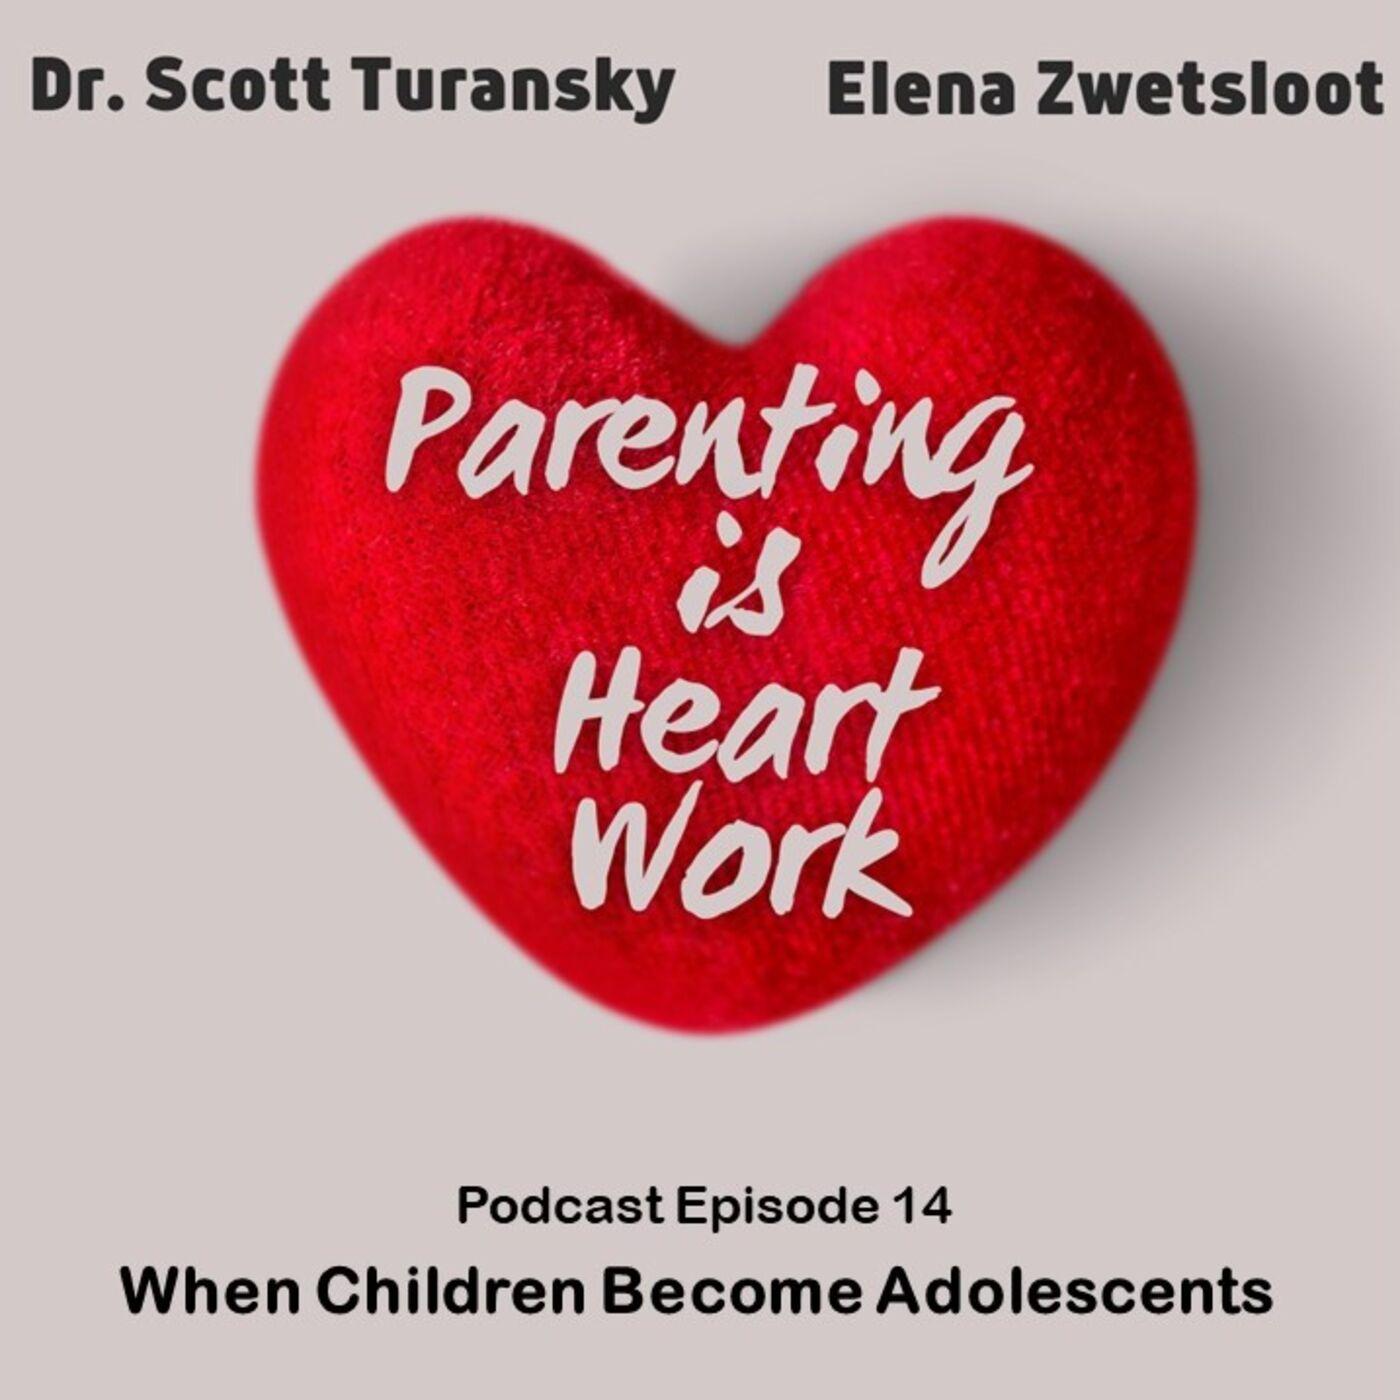 13. When Children Become Adolescents